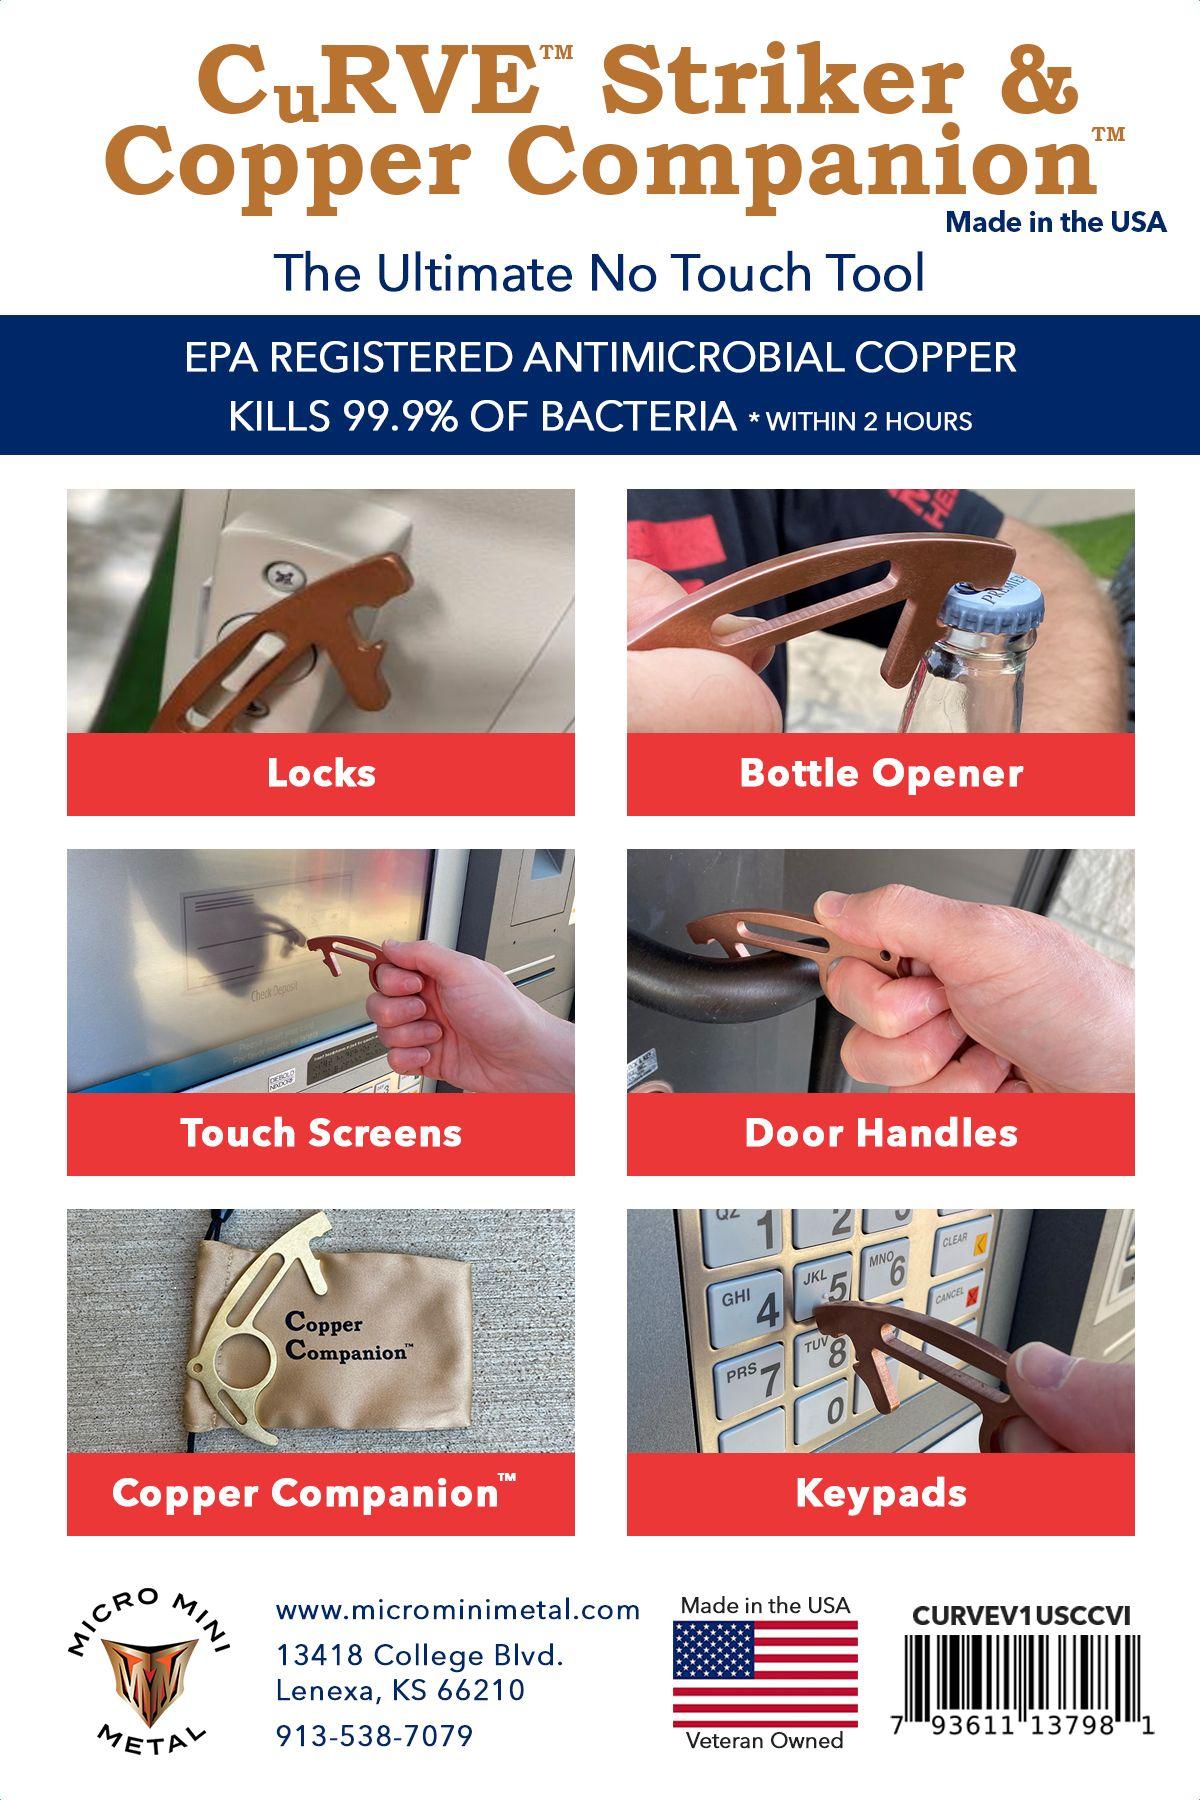 CuRVE Striker and Copper Companion Uses